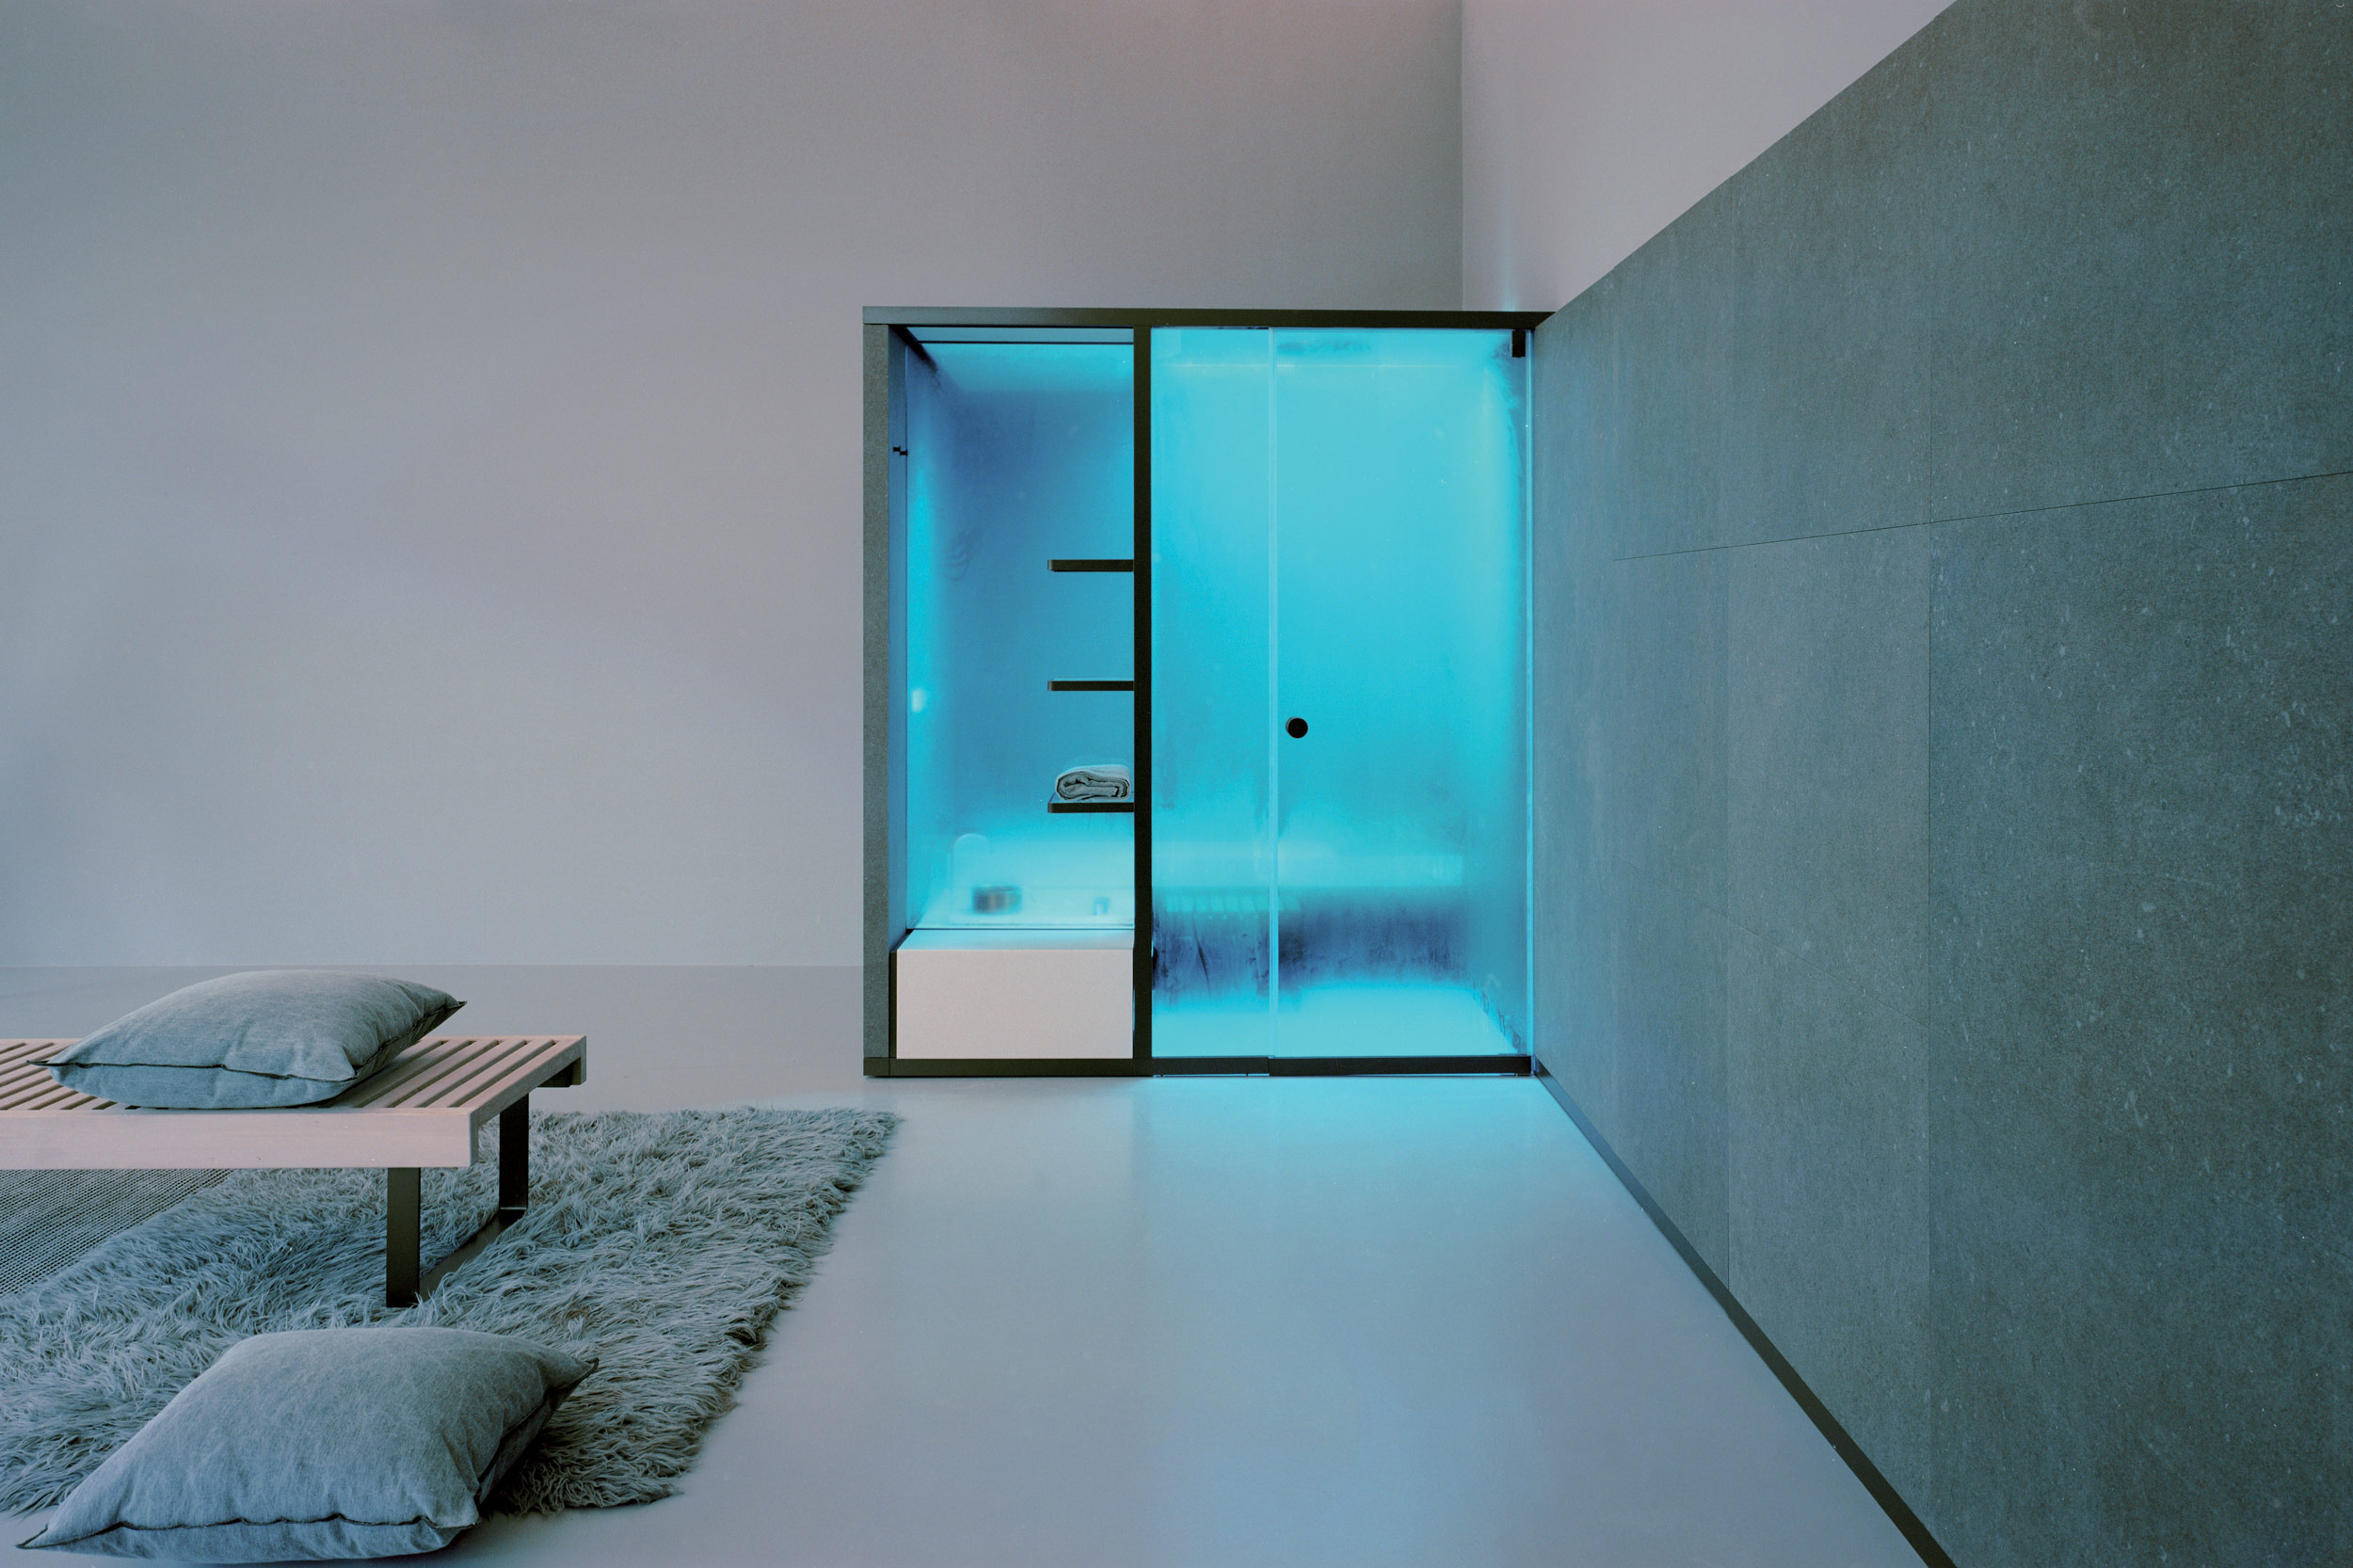 Sauna bagno turco e wellness effegibi - Bagno turco in casa ...